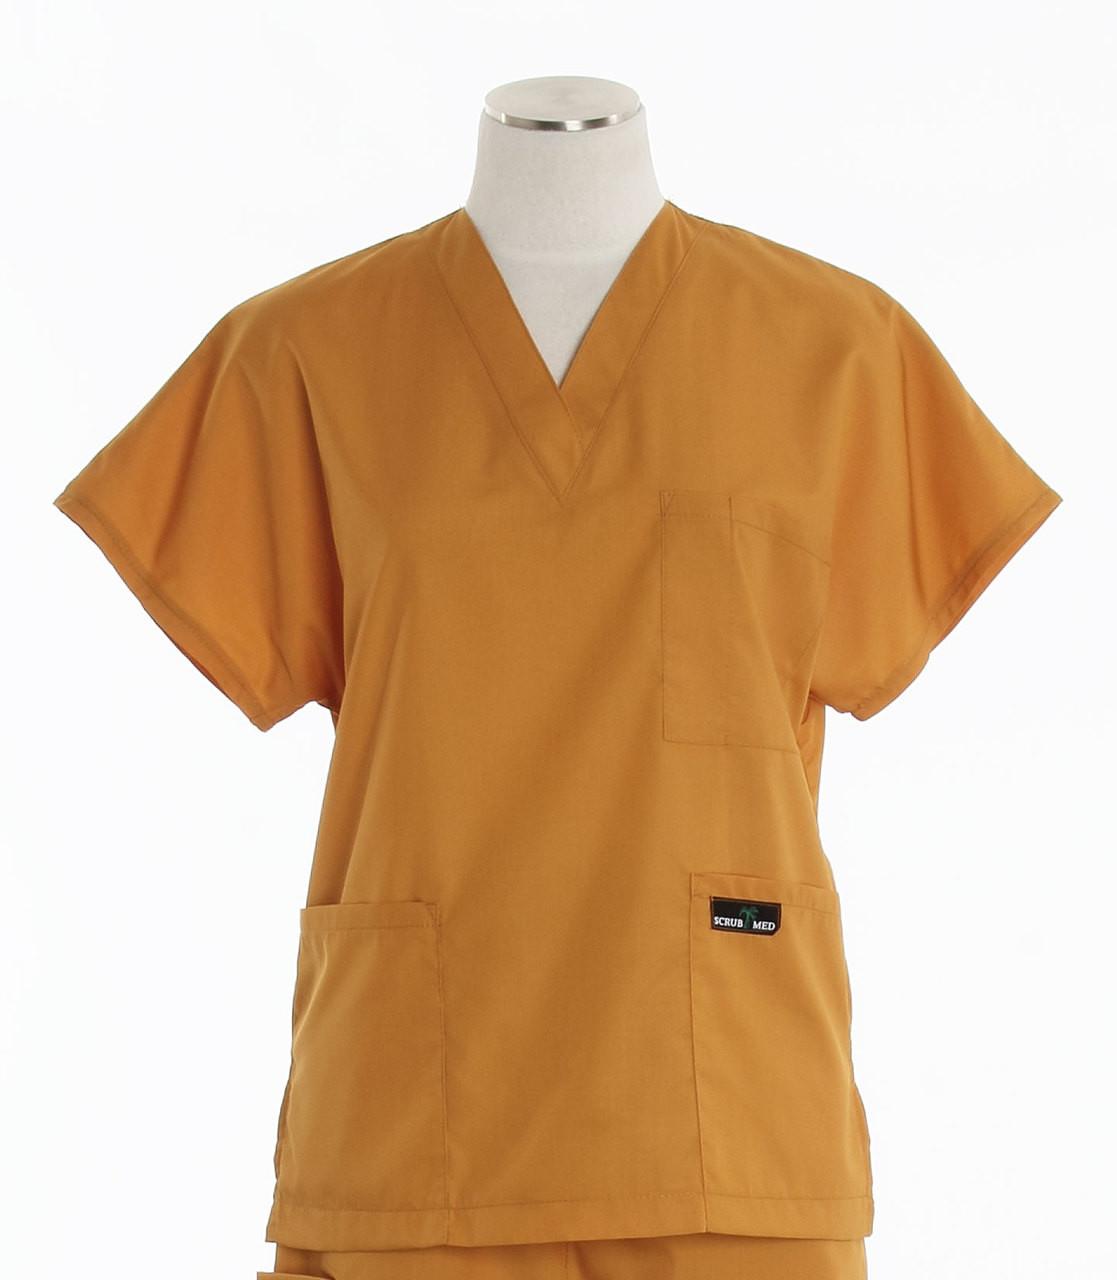 2a8e3fe7643 Scrub Med Womens Solid V-Poc Scrub Top Pumpkin (ScrubLite ...